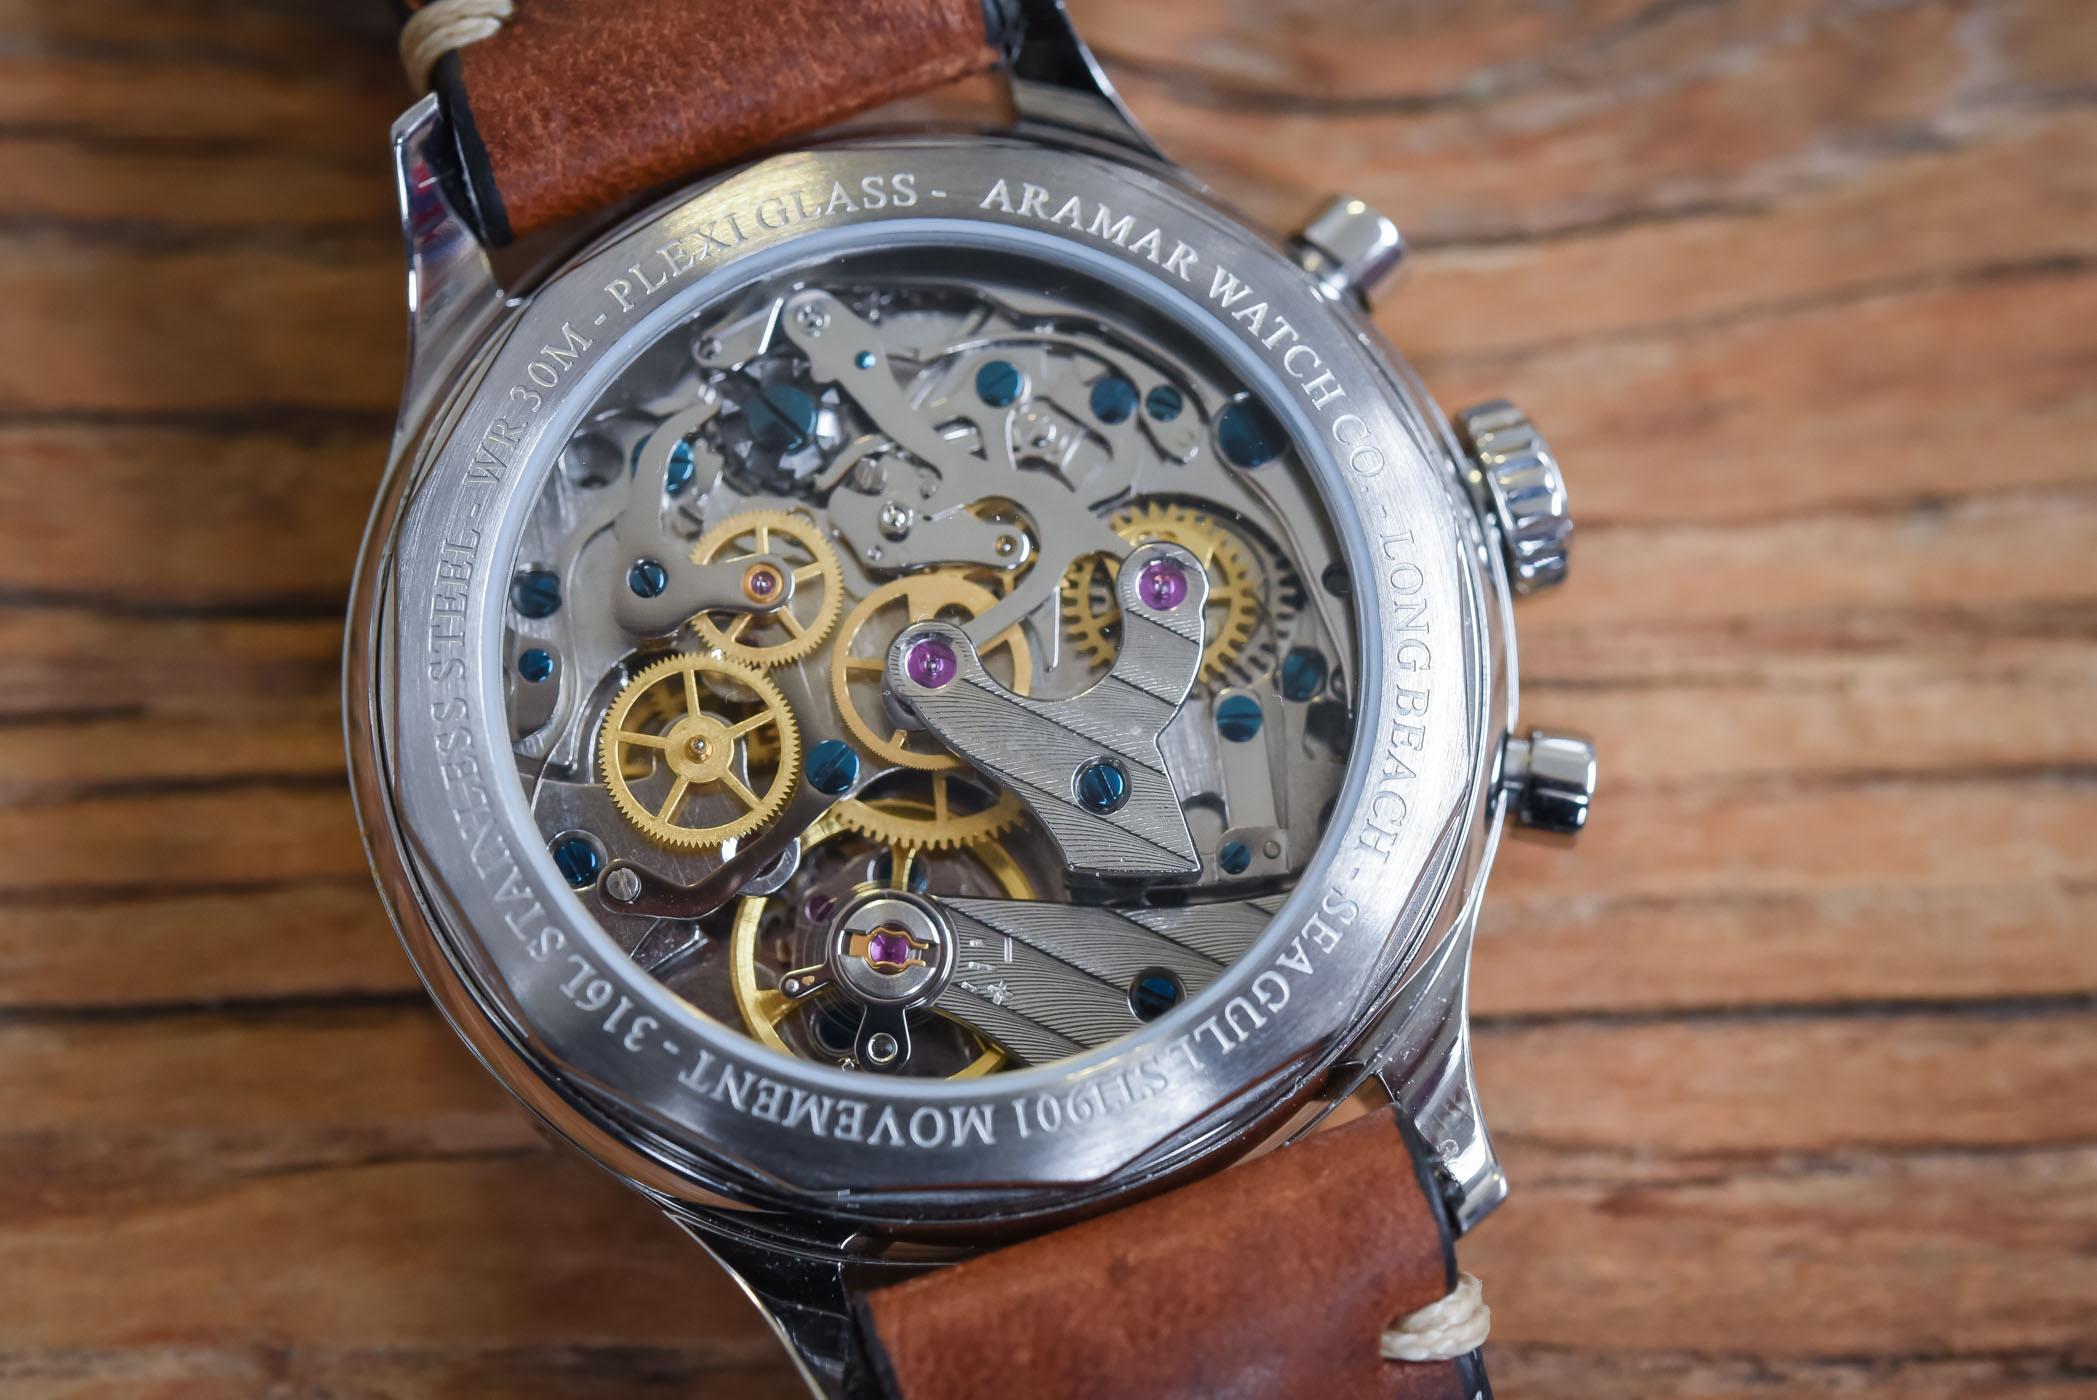 Aramar Long Beach Racing Chronograph - Value Proposition